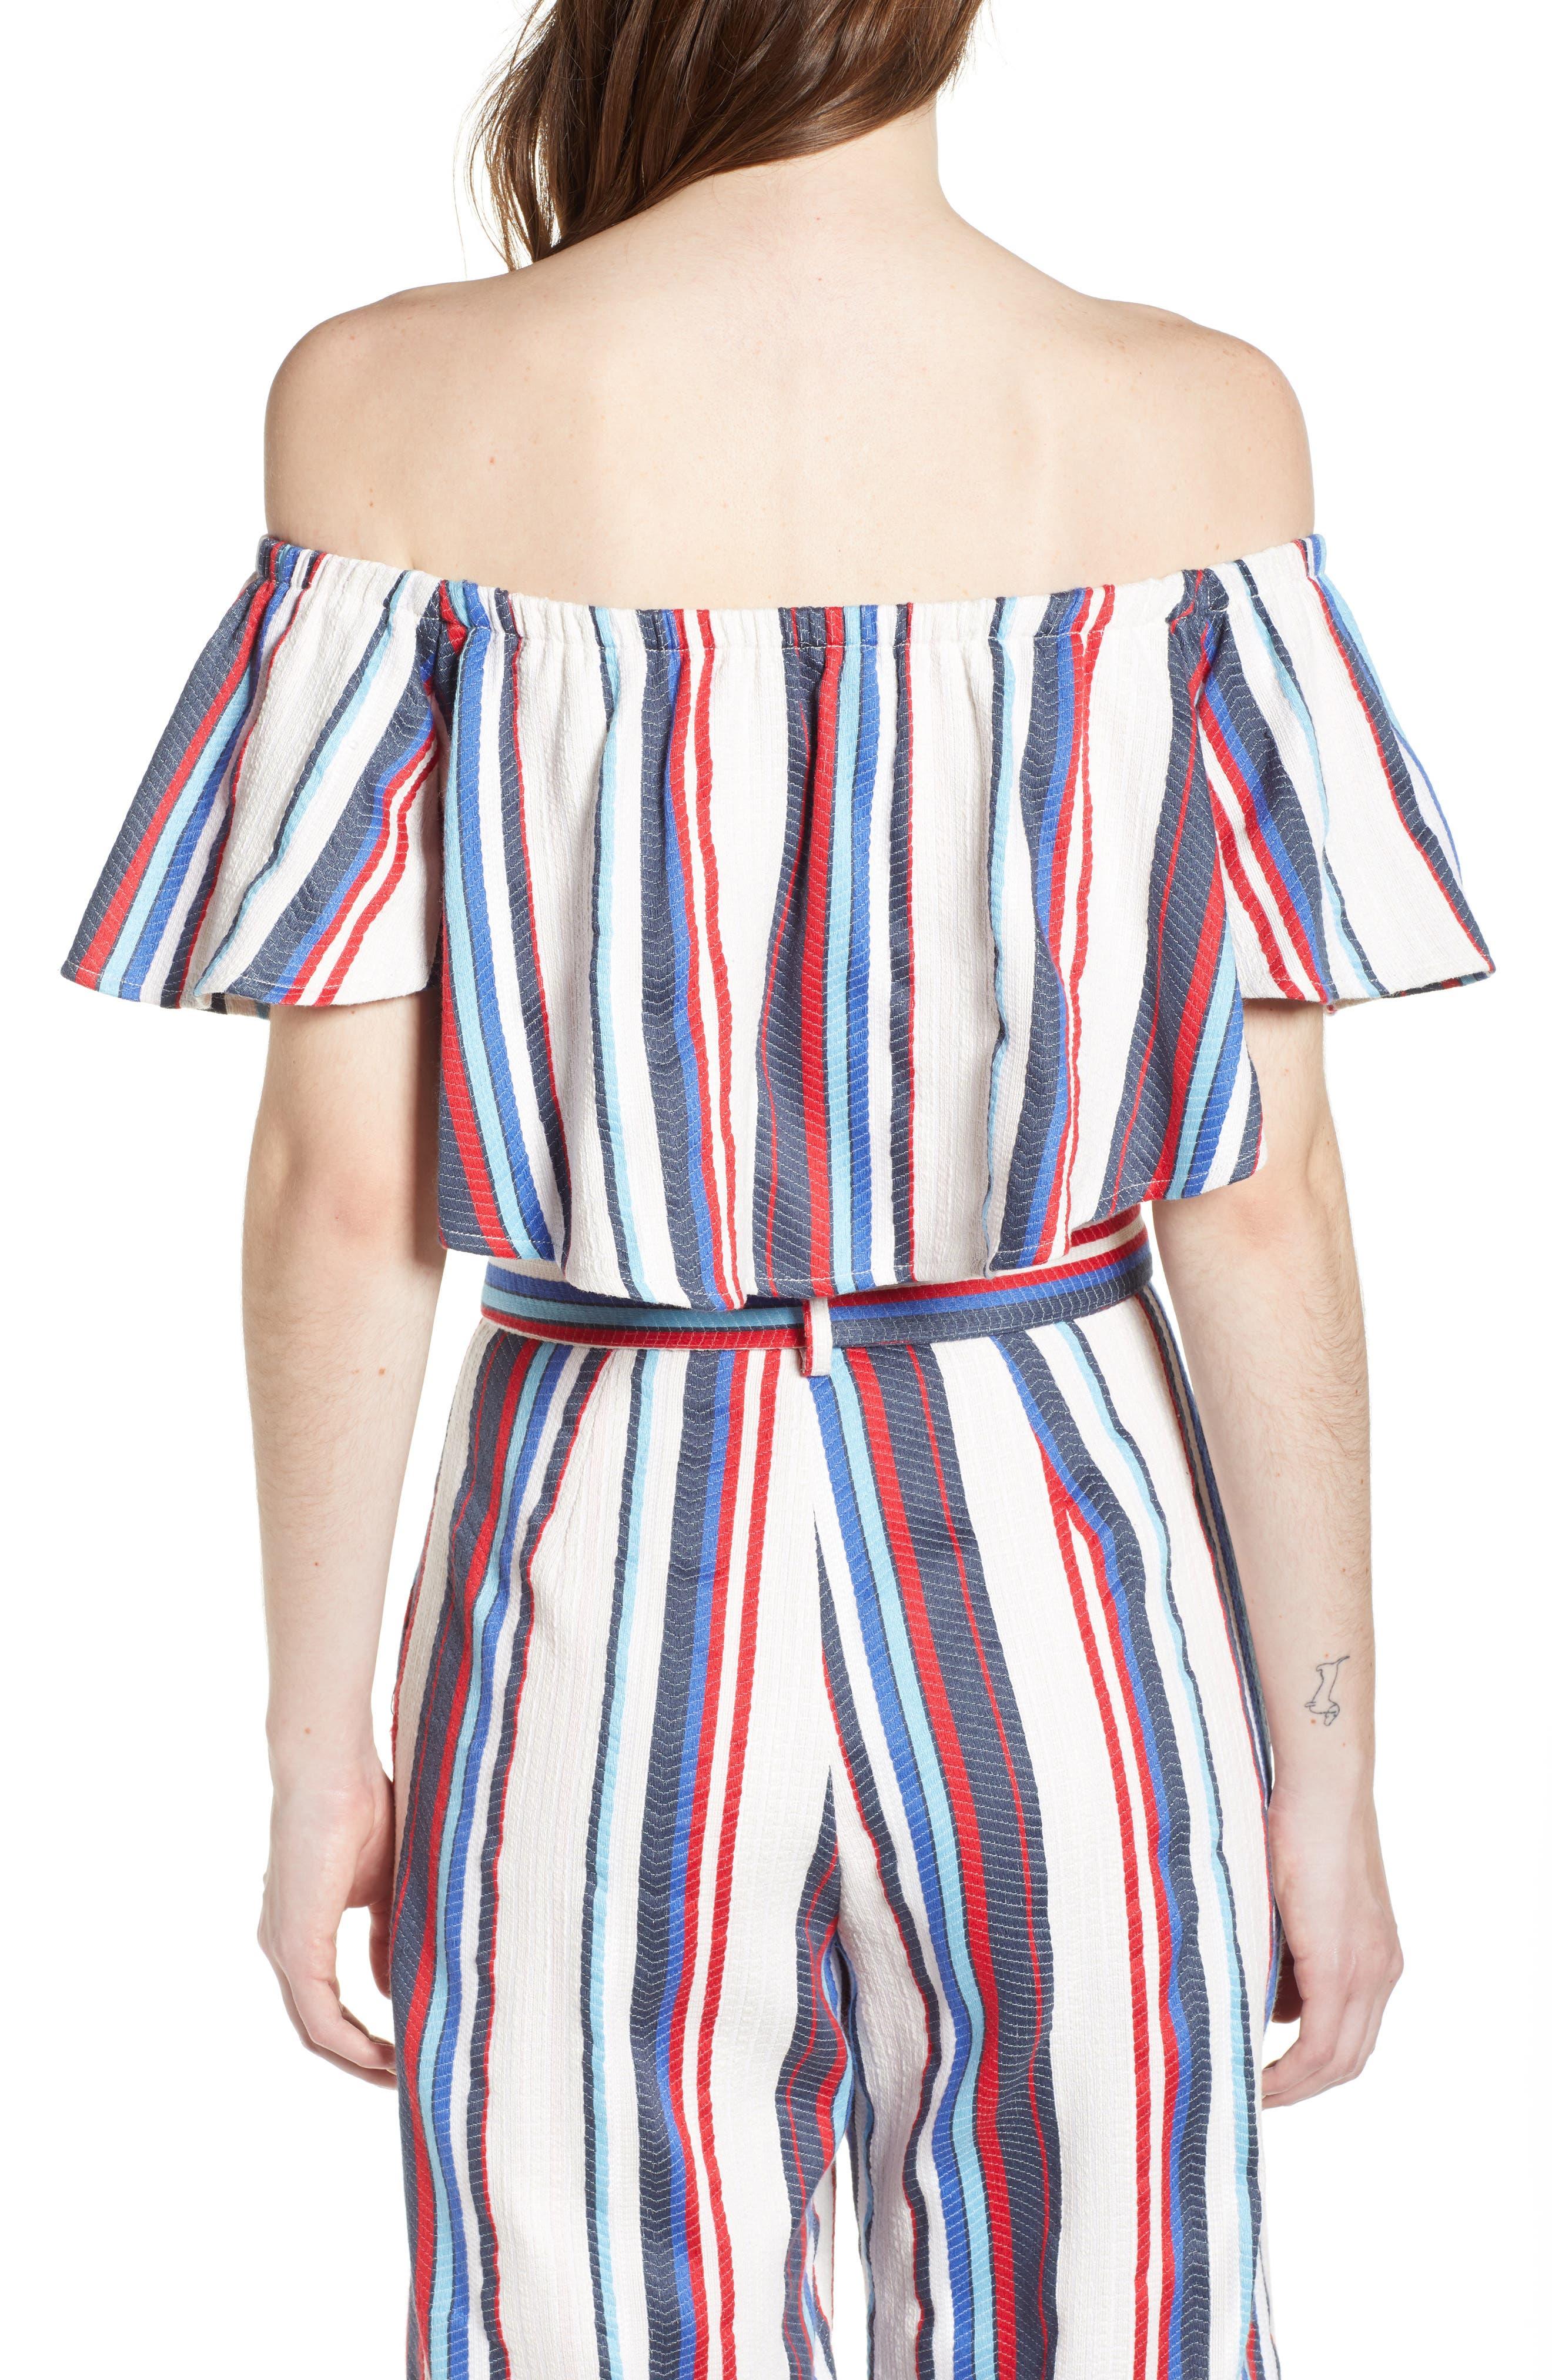 Azul Stripe Off the Shoulder Crop Top,                             Alternate thumbnail 2, color,                             400